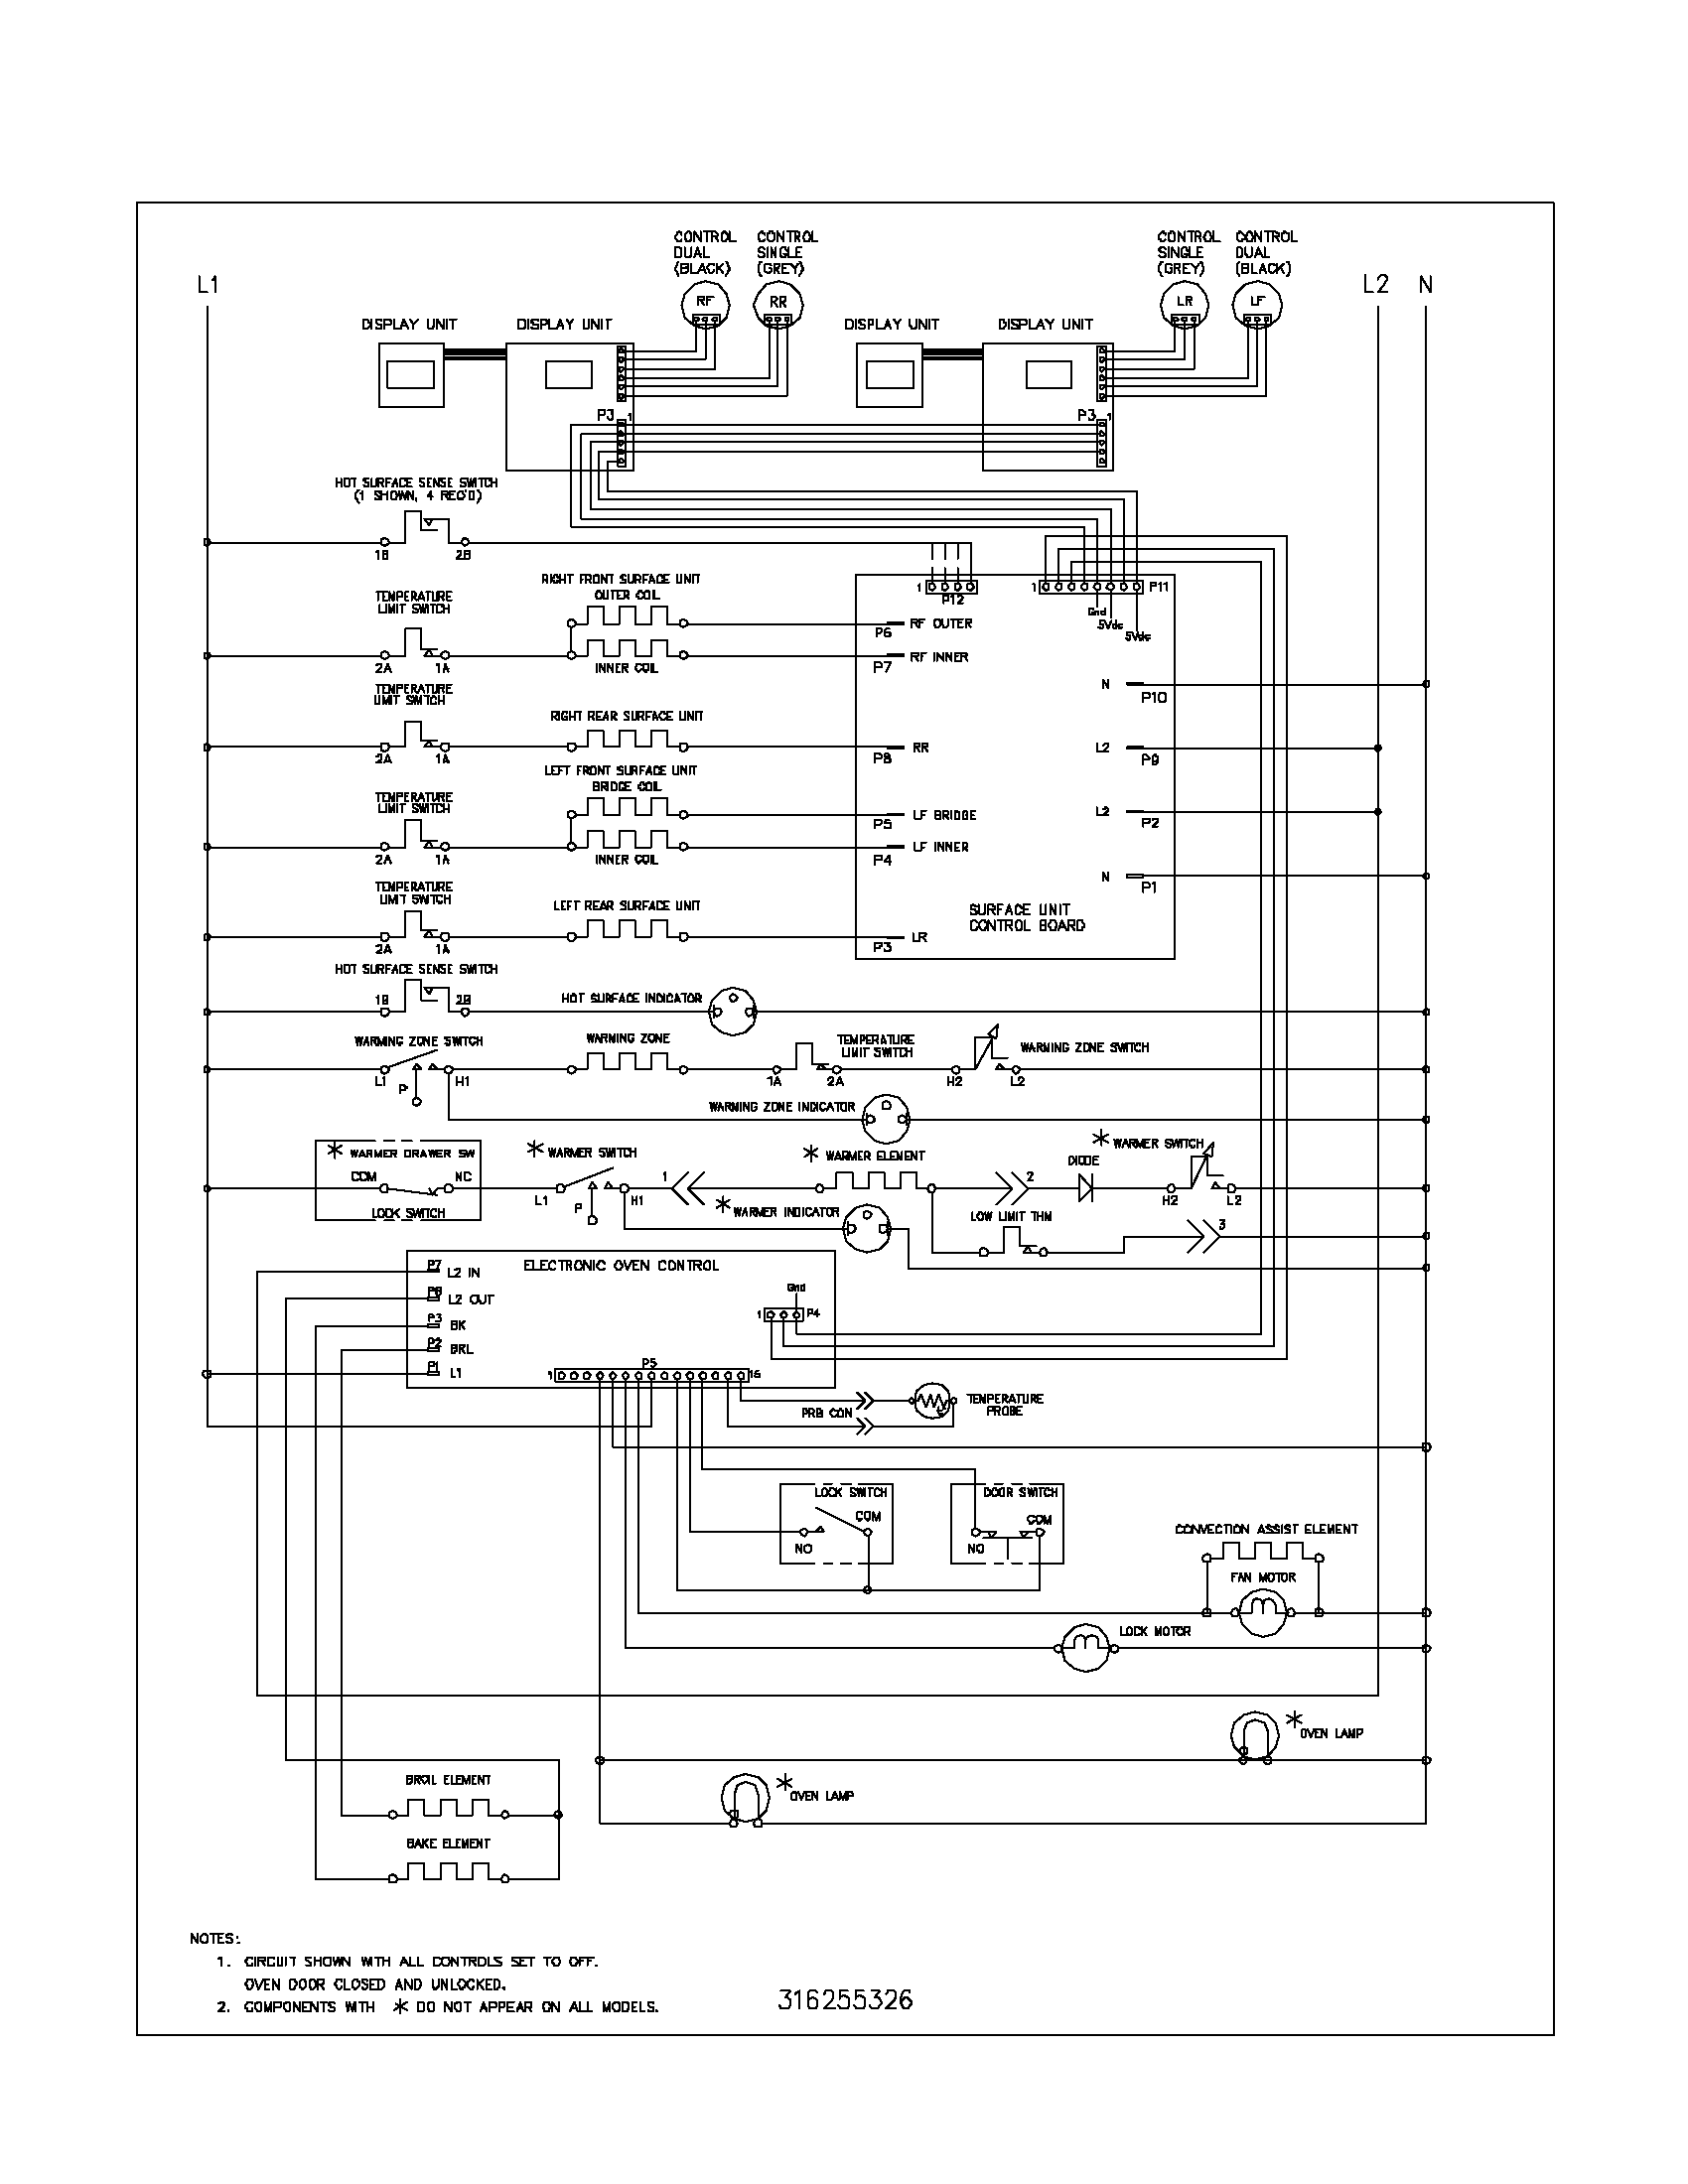 Hvac Wiring Diagrams Furthermore Intertherm Heat Pump Wiring Diagram